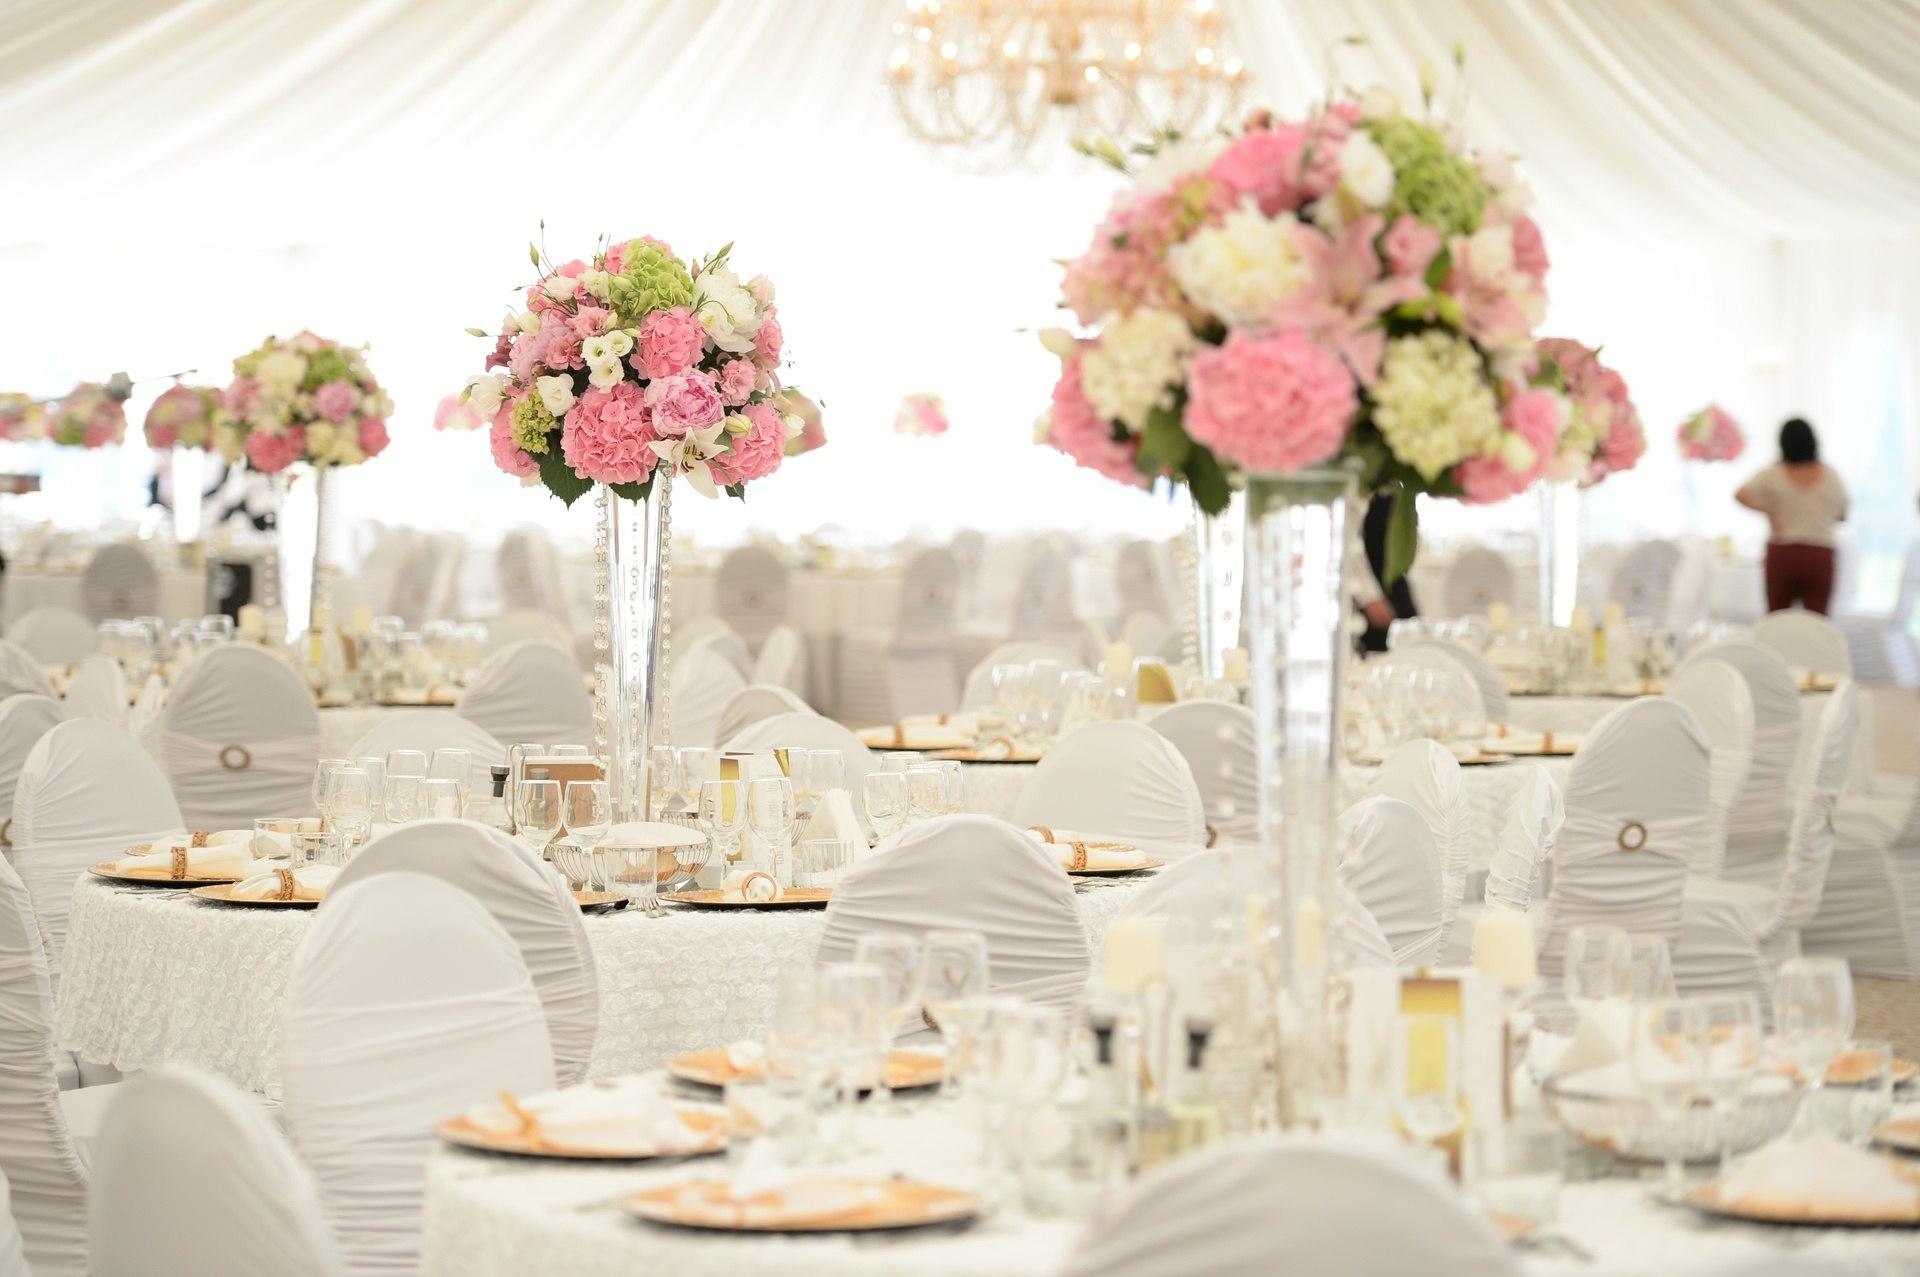 CZ5US95LQLI - Правила декорирования столов на свадьбе